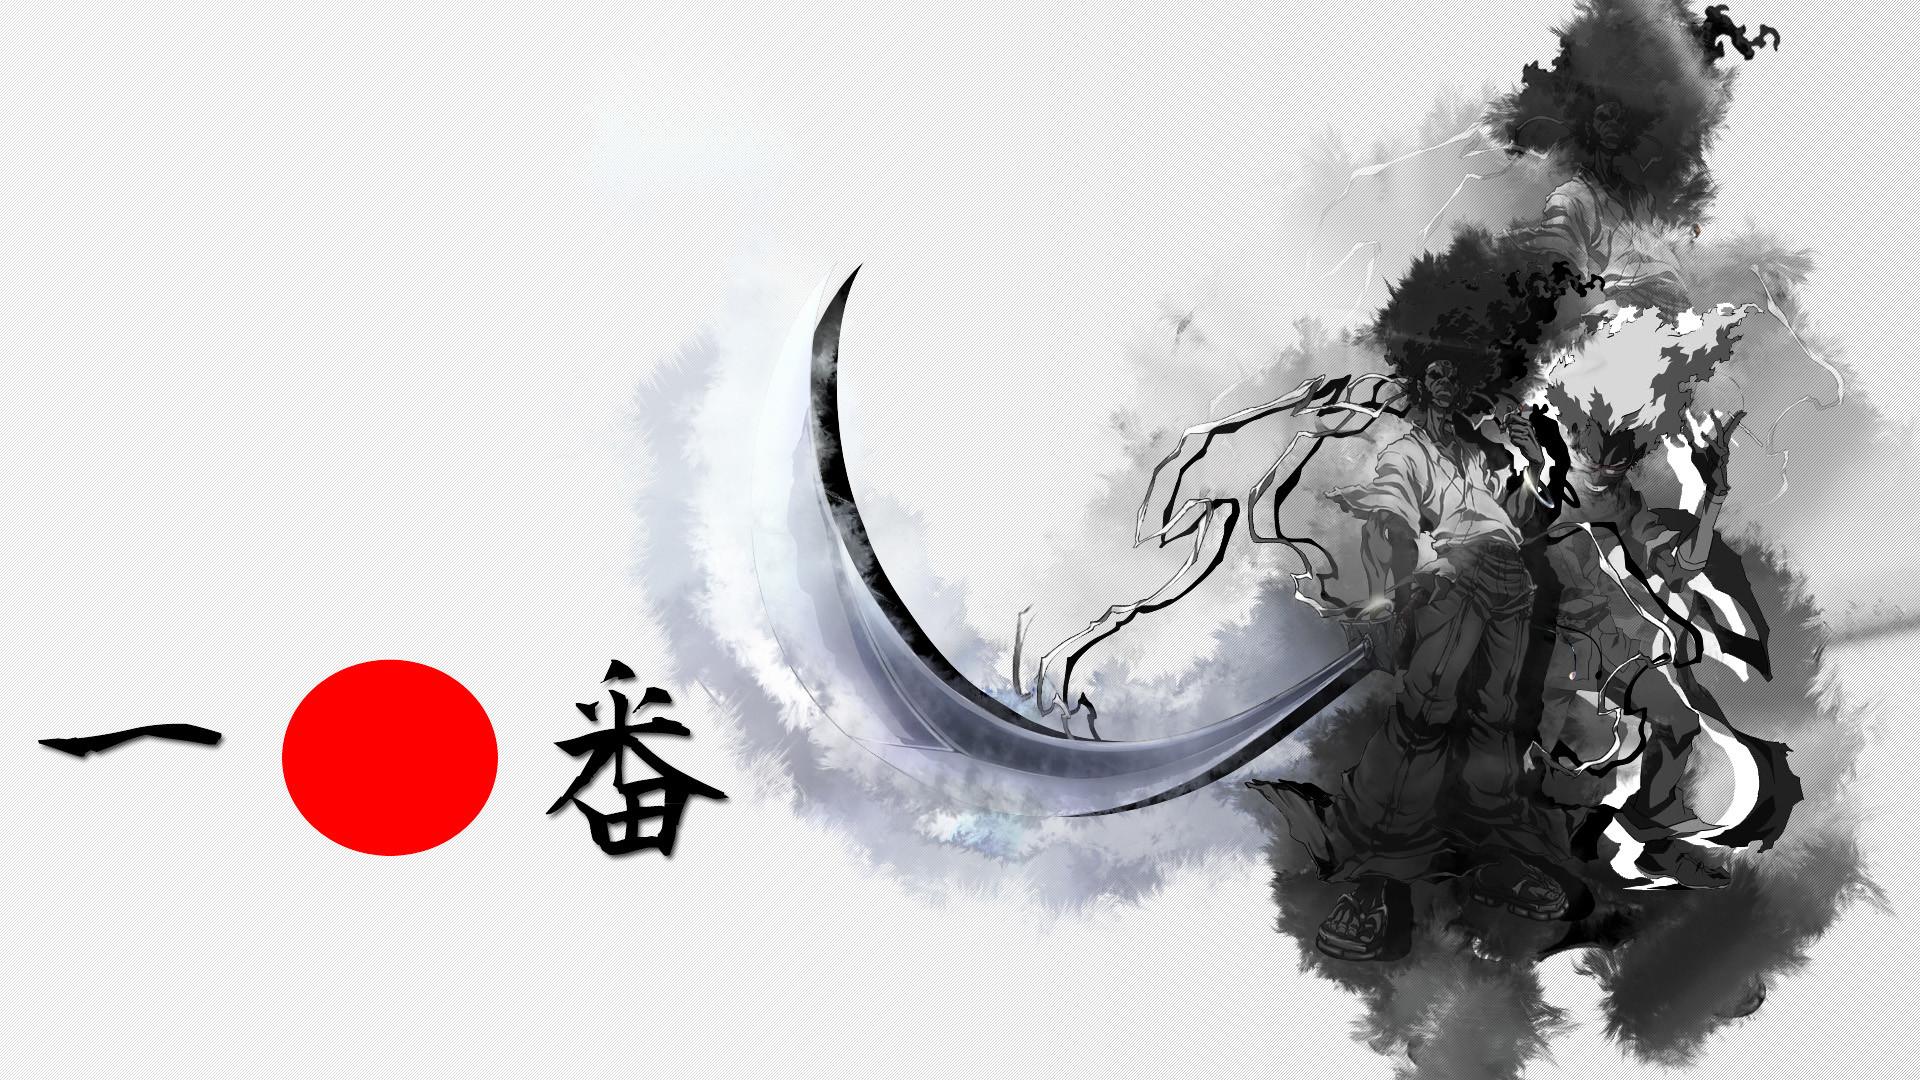 Afro Samurai anime game f wallpaper     91855   WallpaperUP